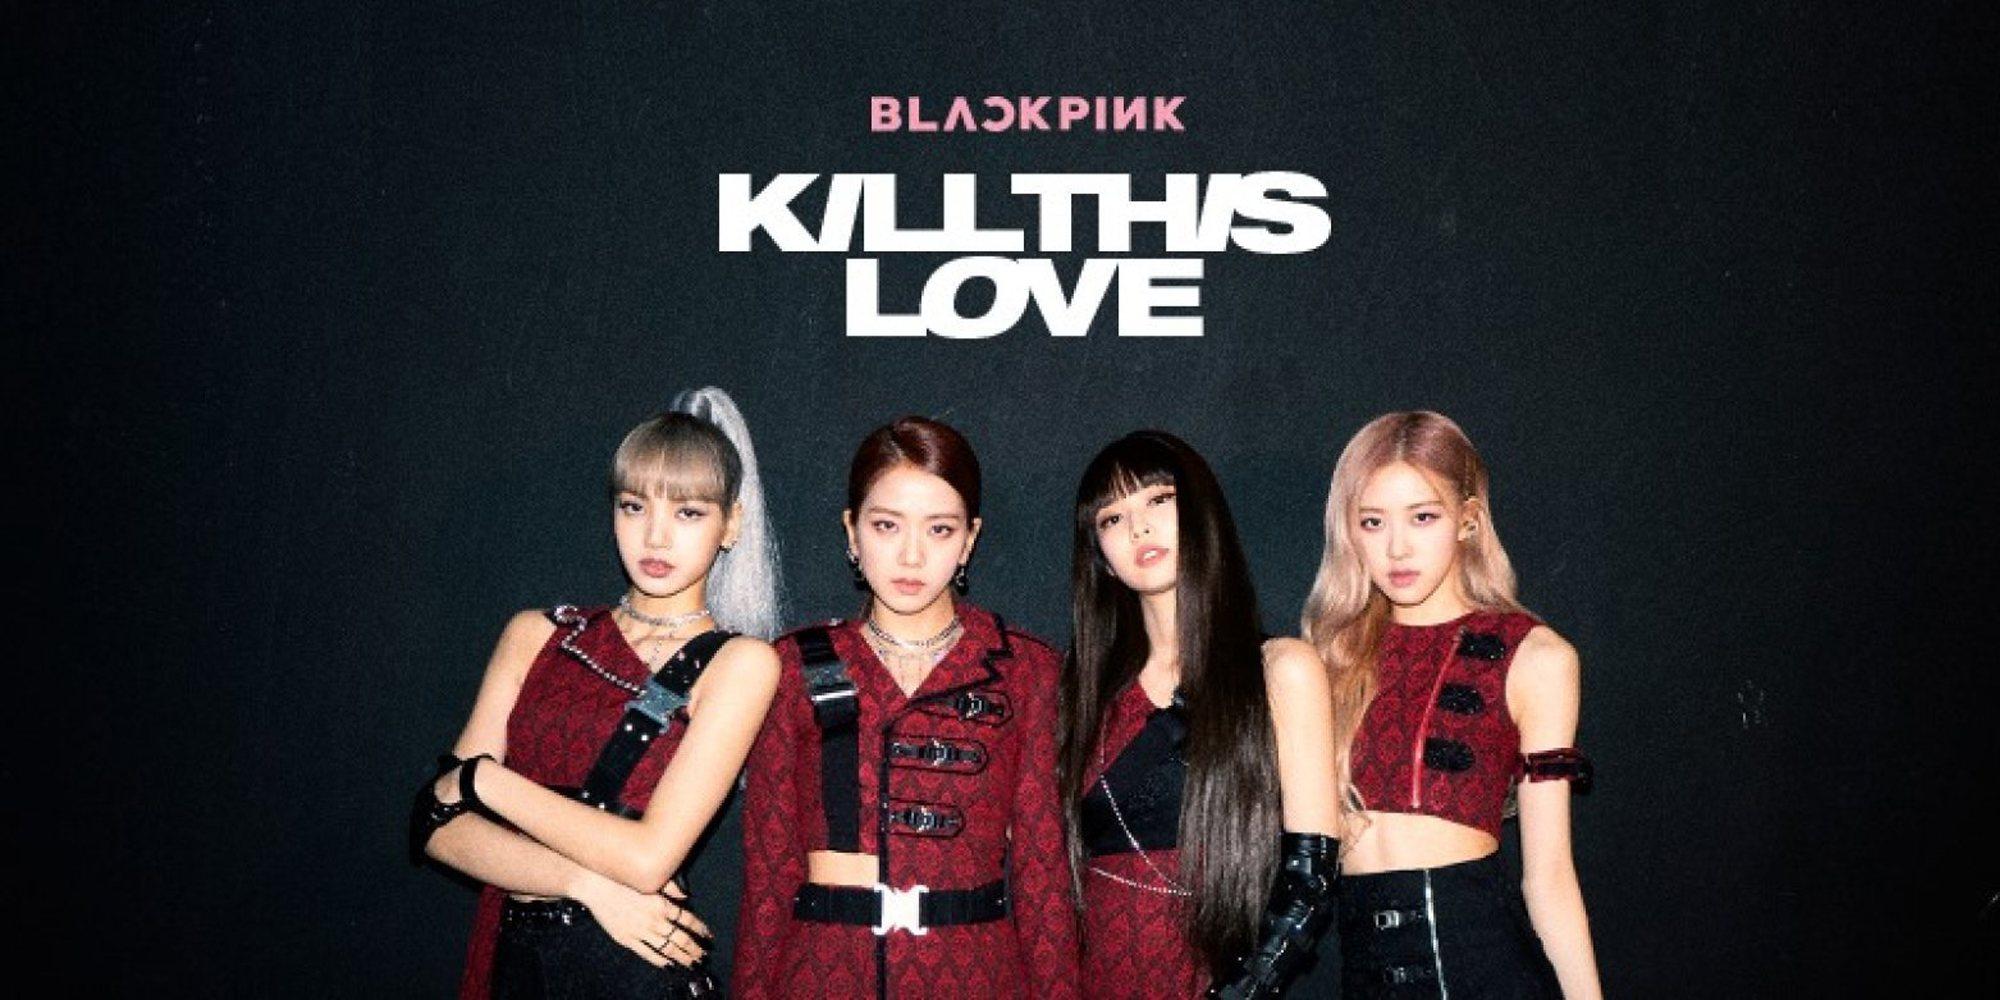 El viral e histórico éxito de Blackpink con 'Kill This Love'